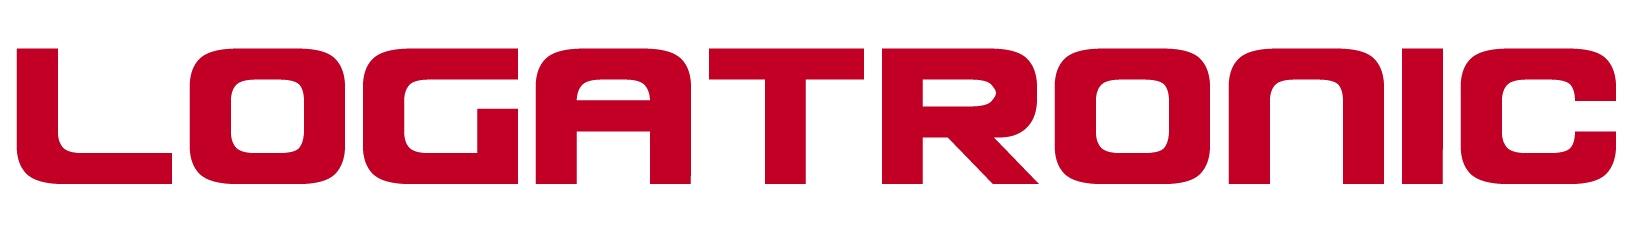 Logatronic Titel Logo